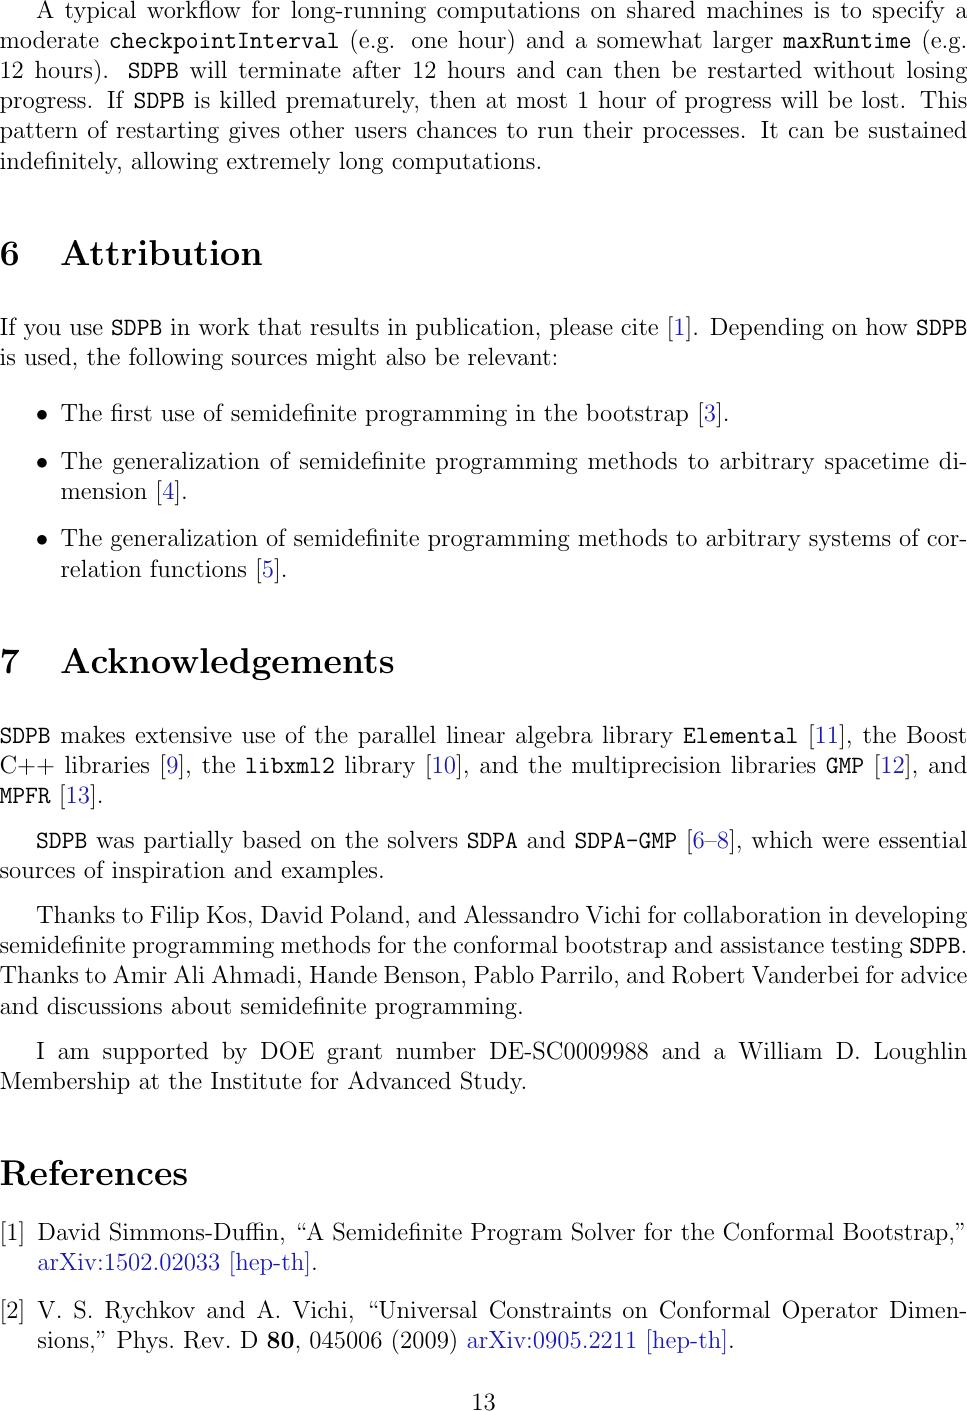 SDPB Manual